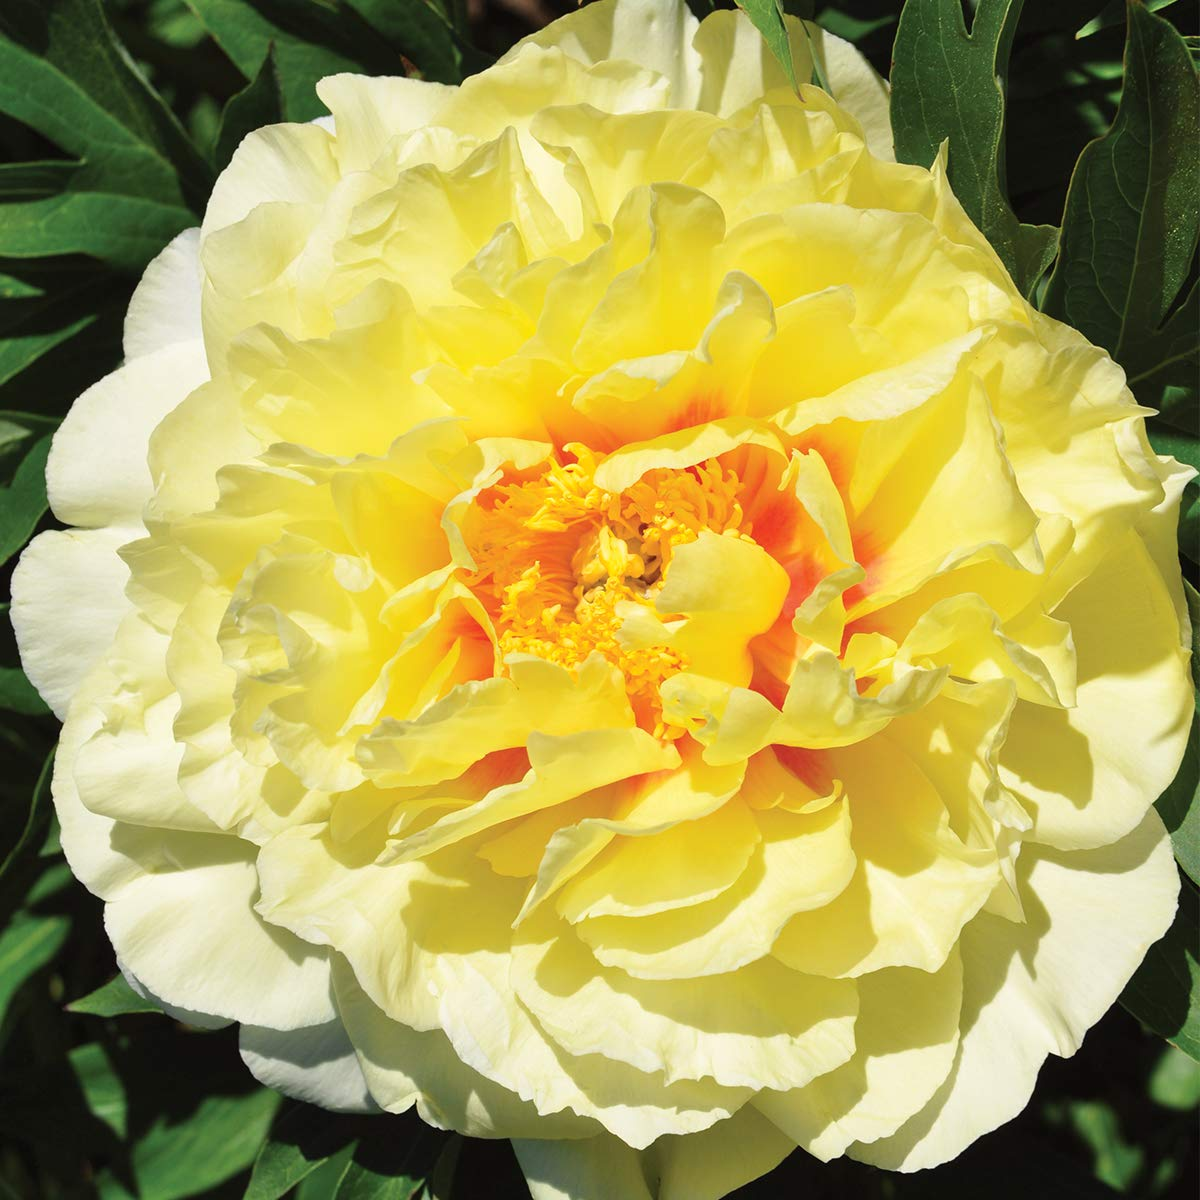 Burpee 'Bartzella' Itoh Perennial Peony - 1 Bare Root 3-5 Eye Plant